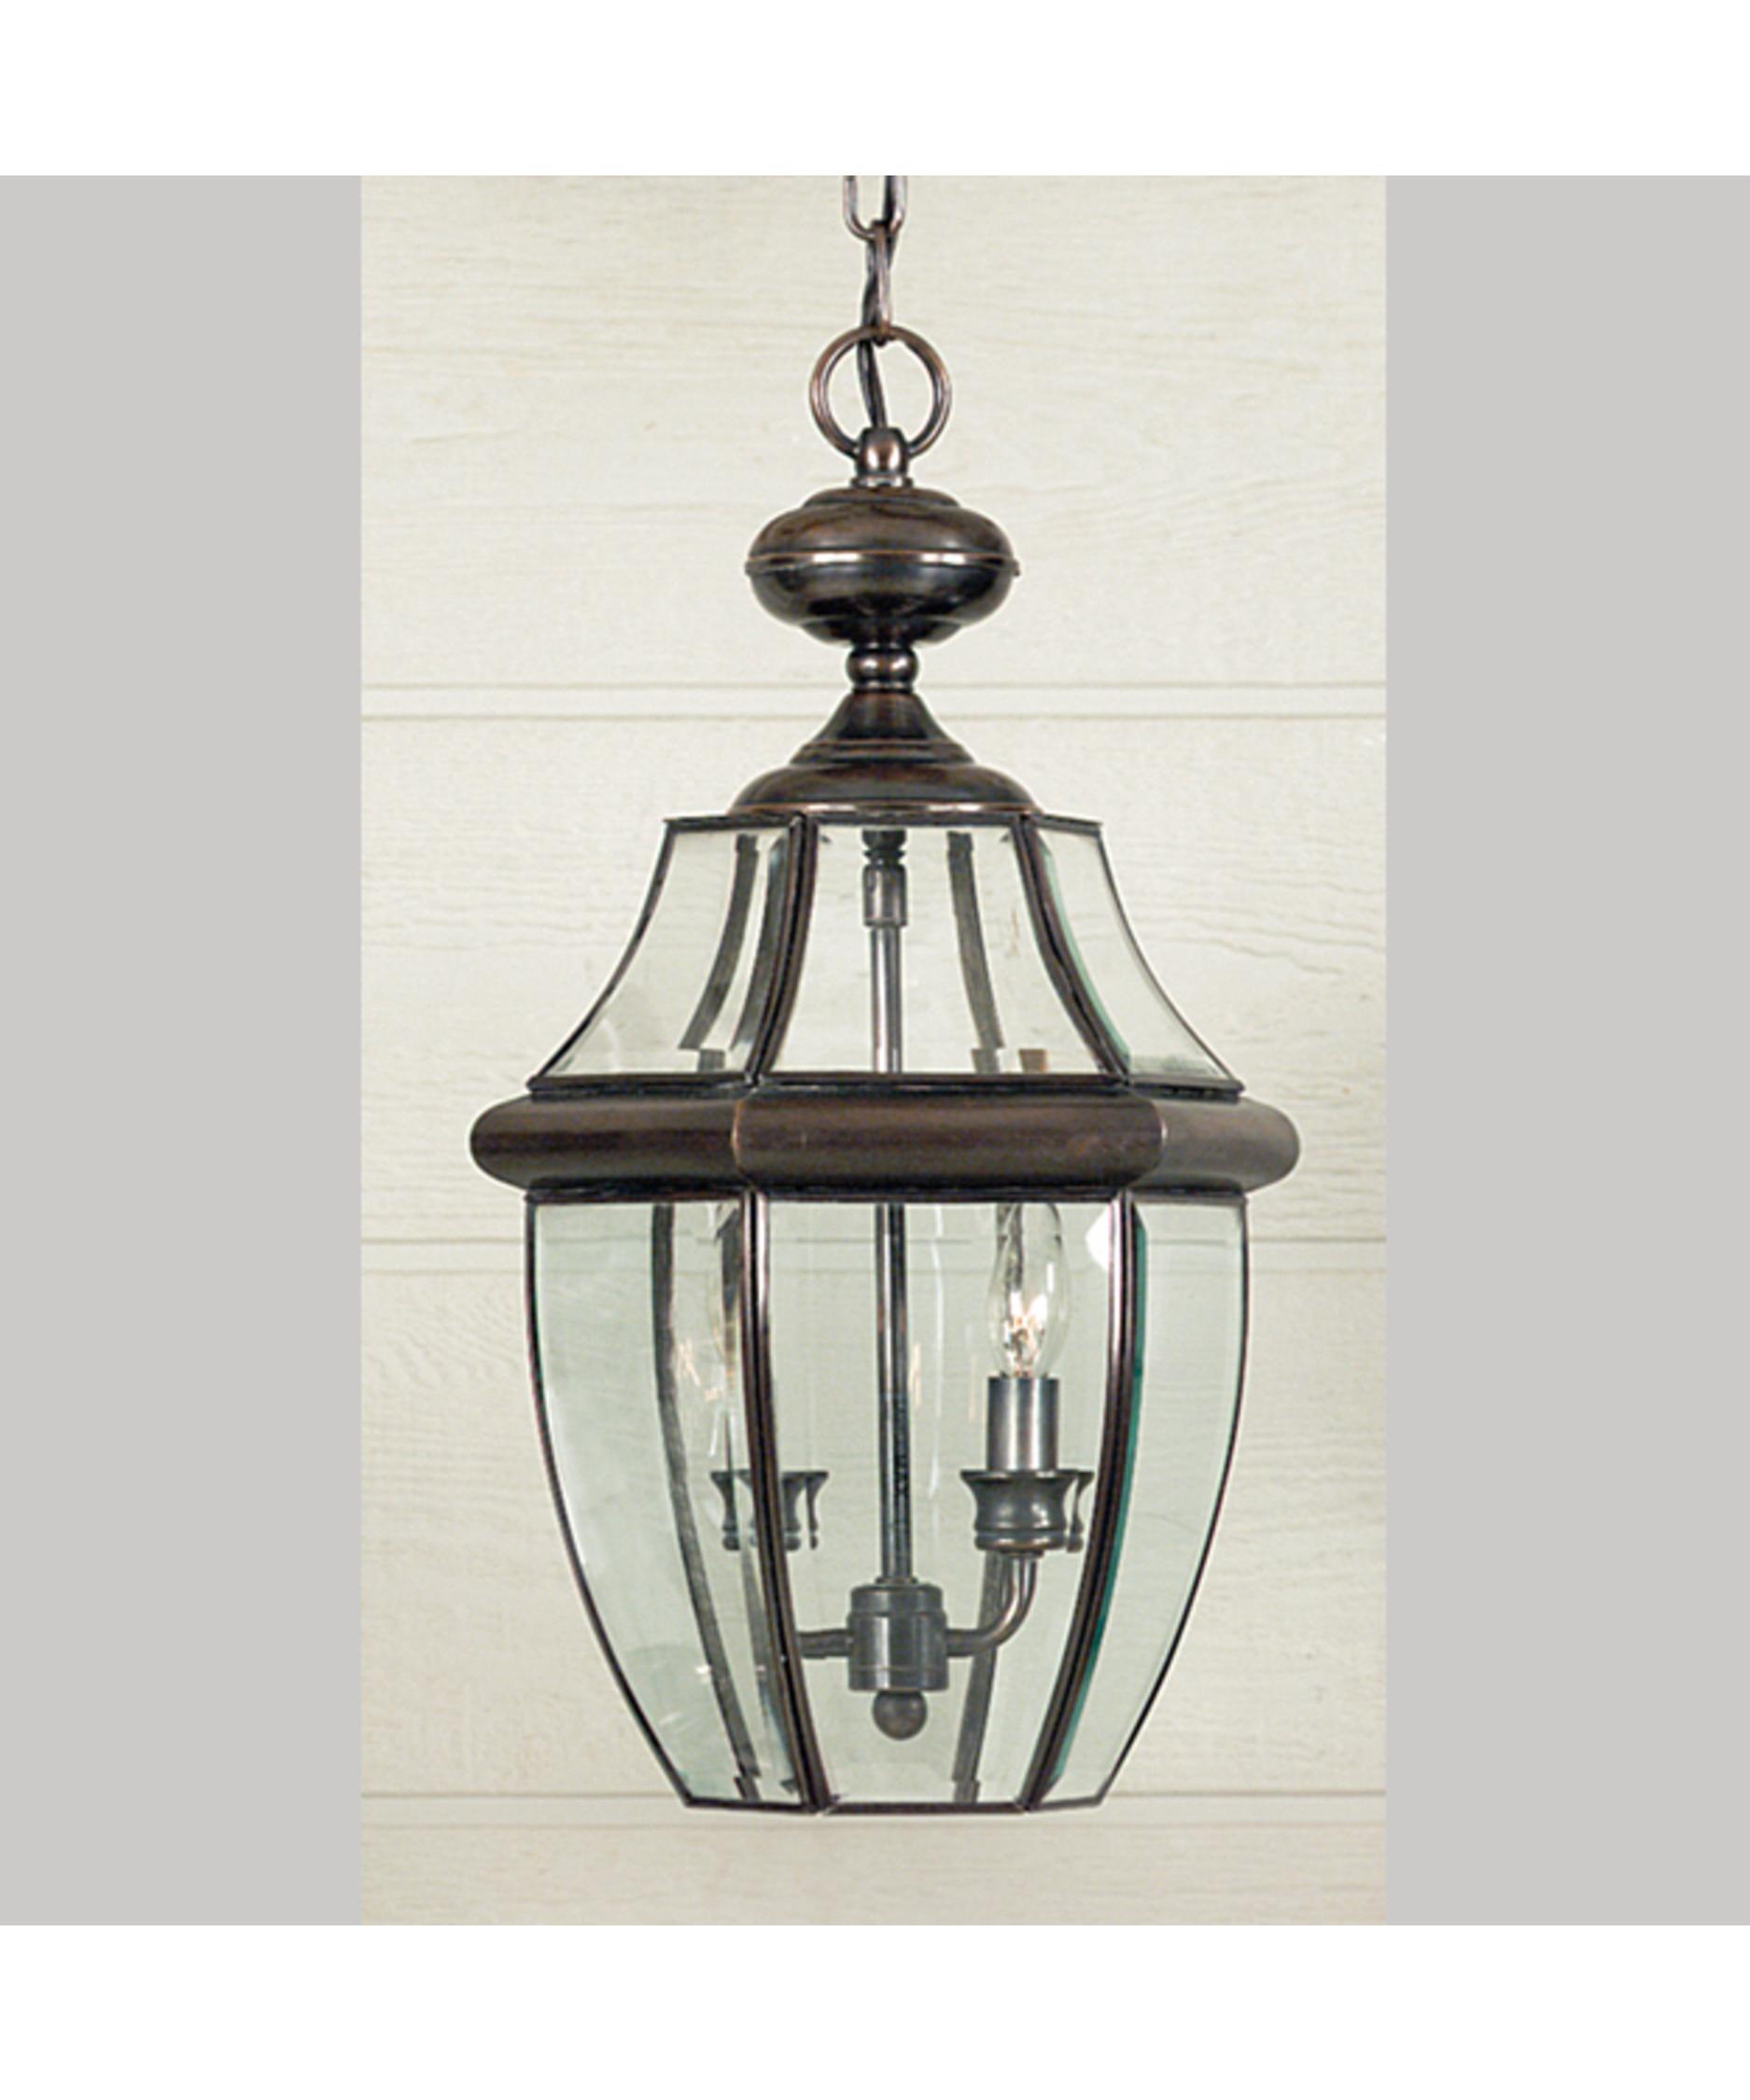 Quoizel Outdoor Lighting Newbury: Quoizel NY1178 Newbury 2 Light Outdoor Hanging Lantern